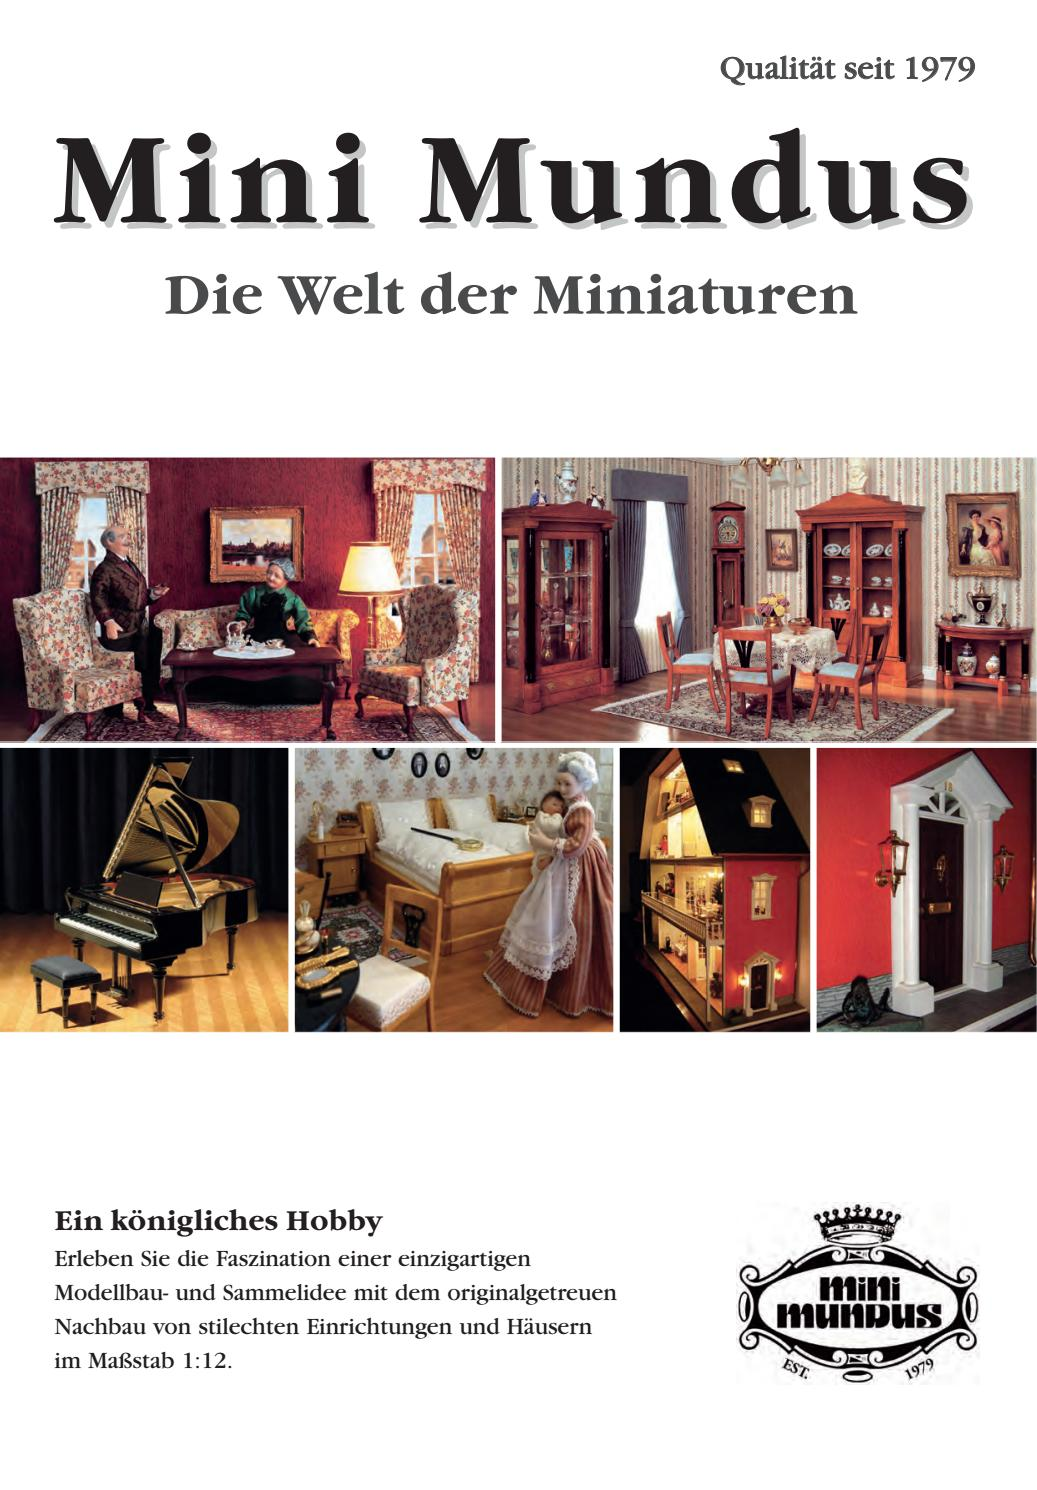 Mini Mundus Katalog - DE by Mini Mundus - issuu